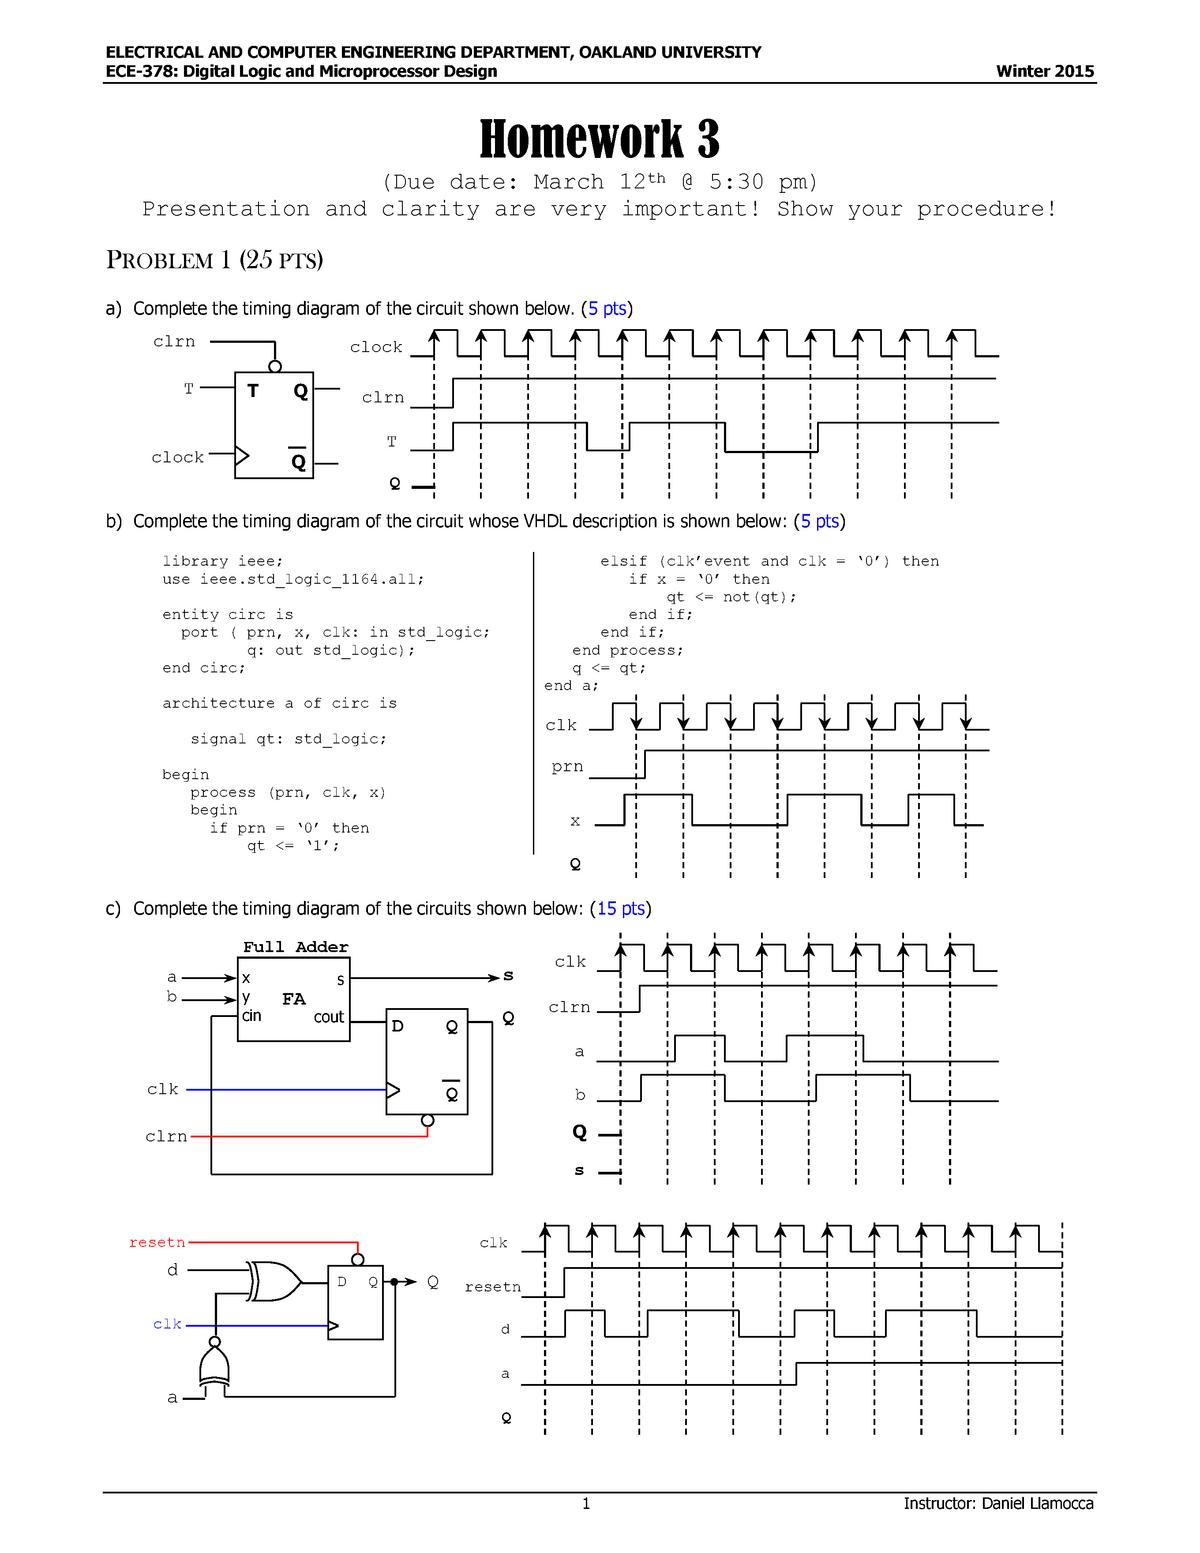 HW3, q + a - Homework assignment 3 - ECE 378: Digital Logic